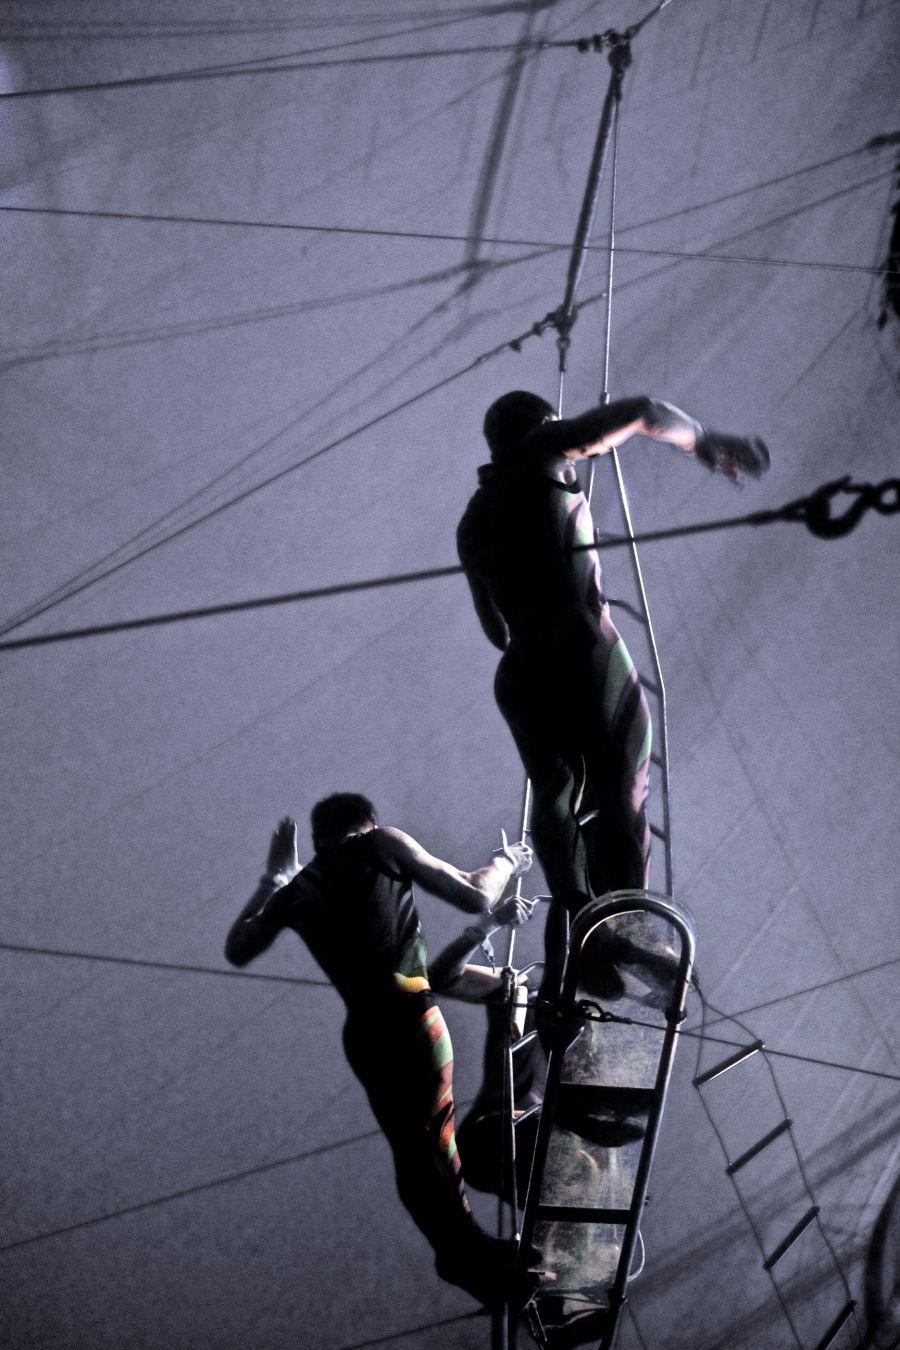 boston big apple circus performance april 29 2015 trapeze performer 5